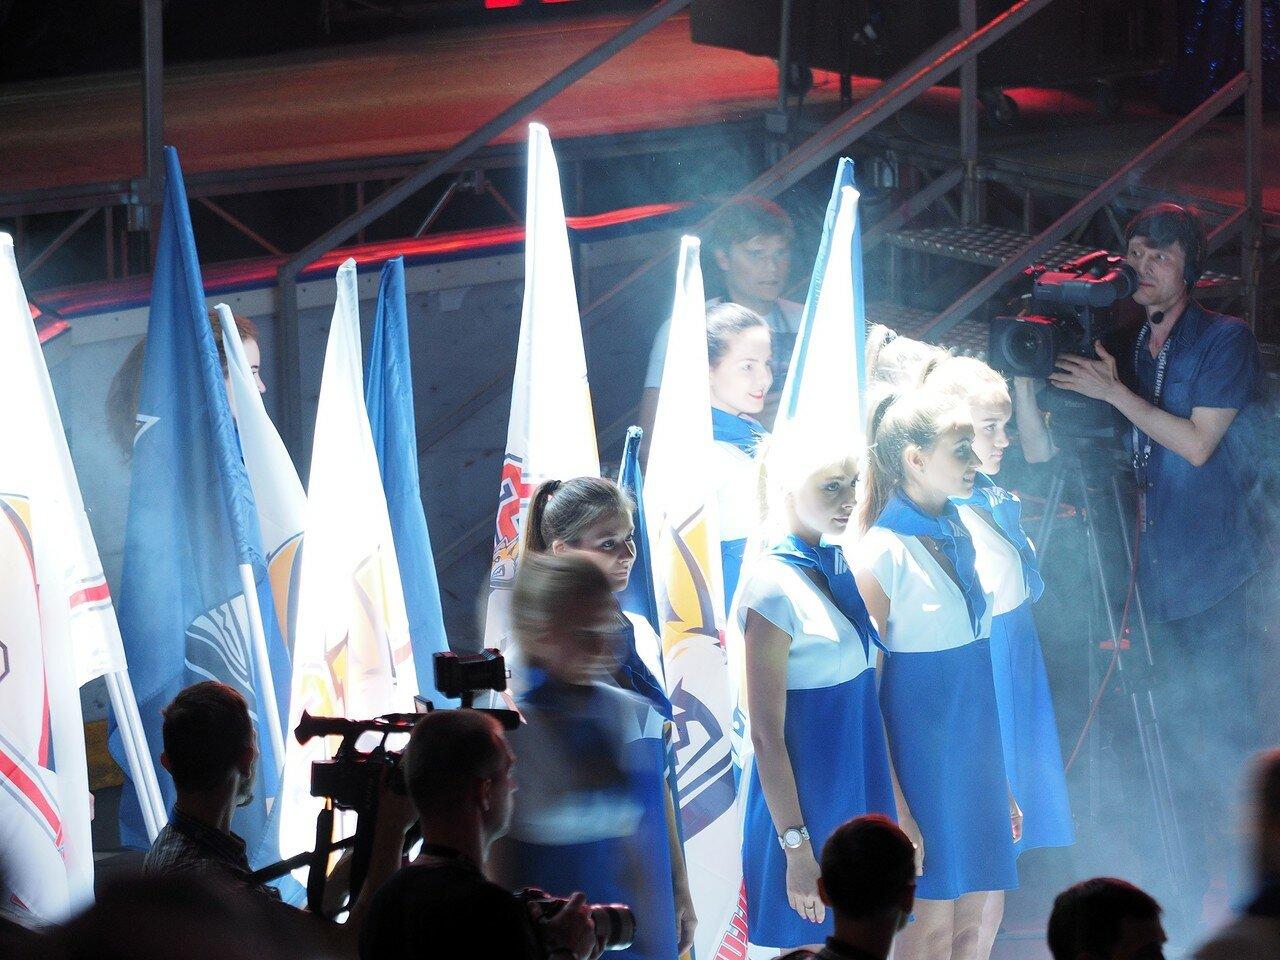 197Церемония чествования команды Металлург27.05.2016